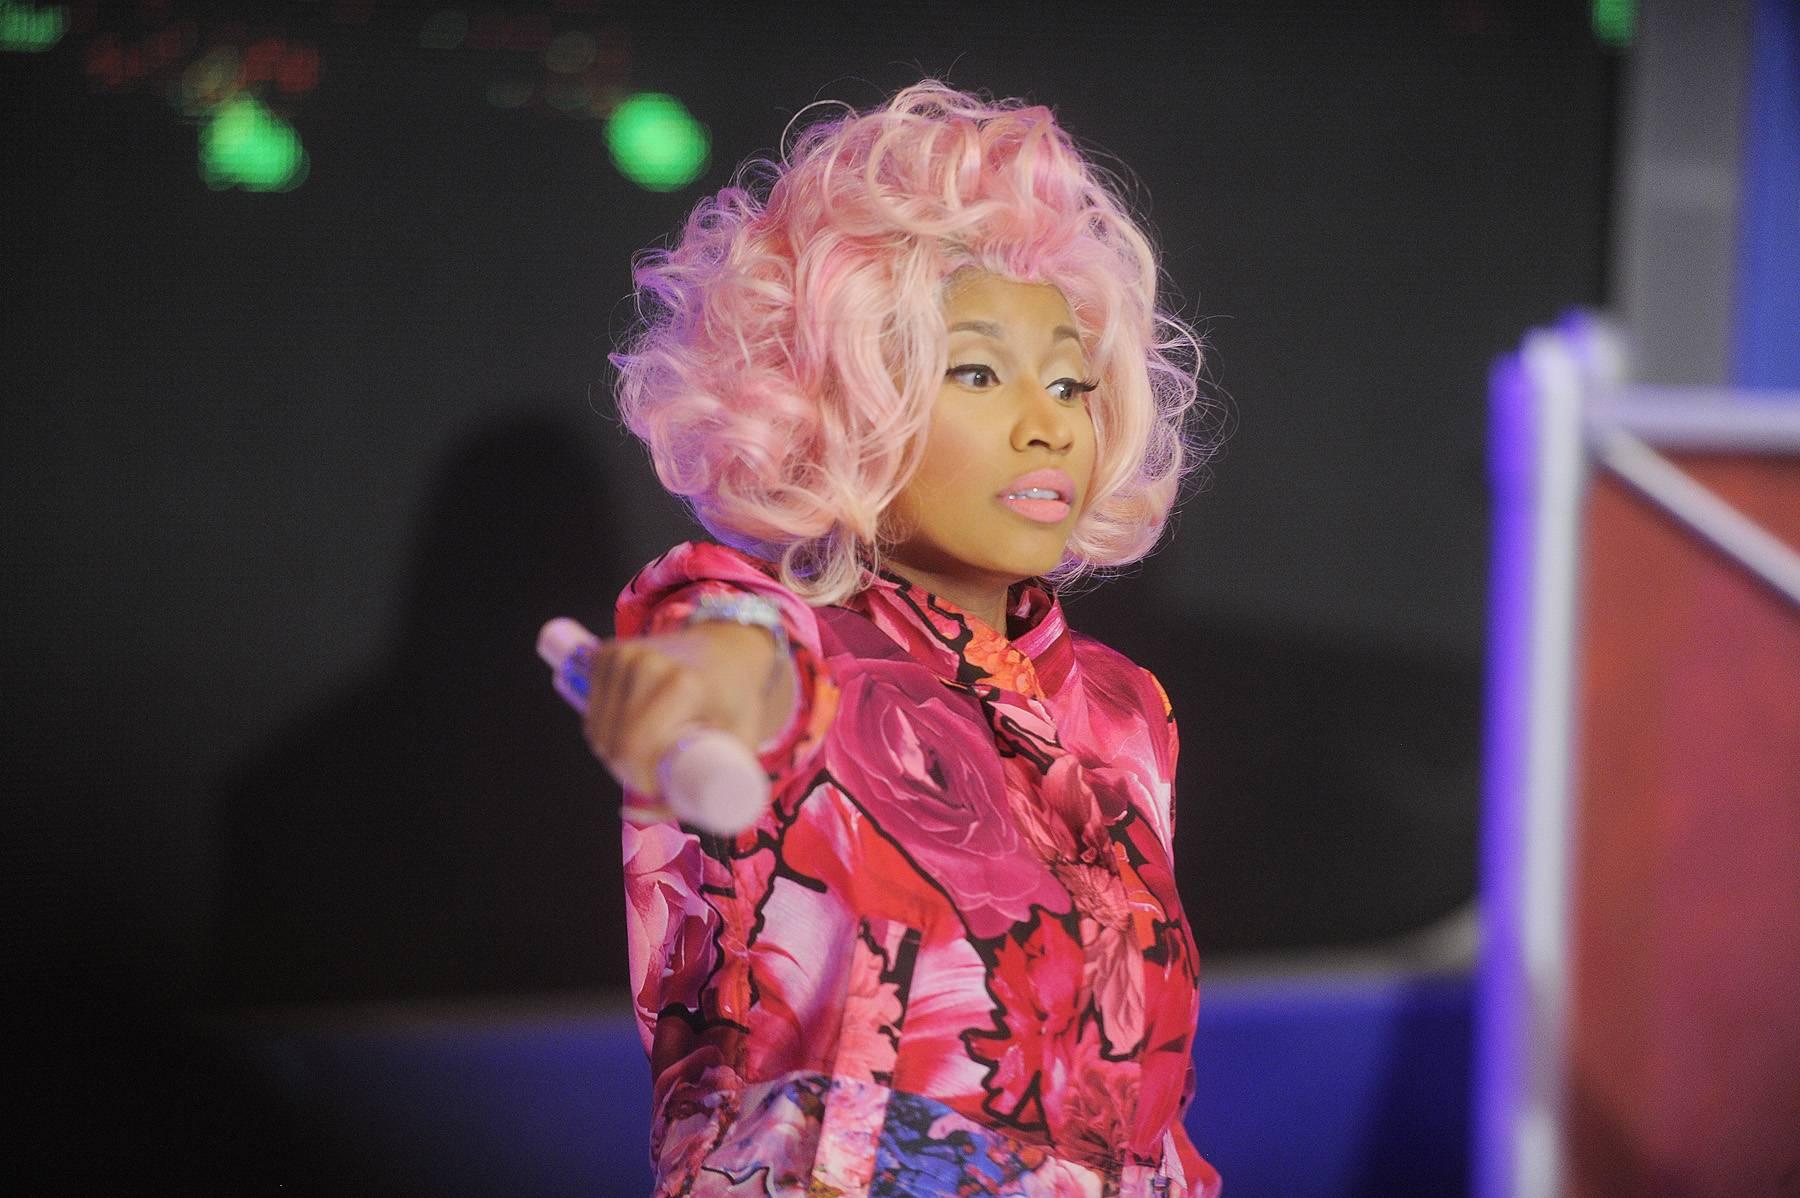 What's Nicki Minaj's Govm't? - Nicki Minaj has two No. 1 albums under her belt, but do you know her government name?Is it:a. Nicole Madison b. Michelle Jackson c. Onika Maraj.(Photo: John Ricard/BET)